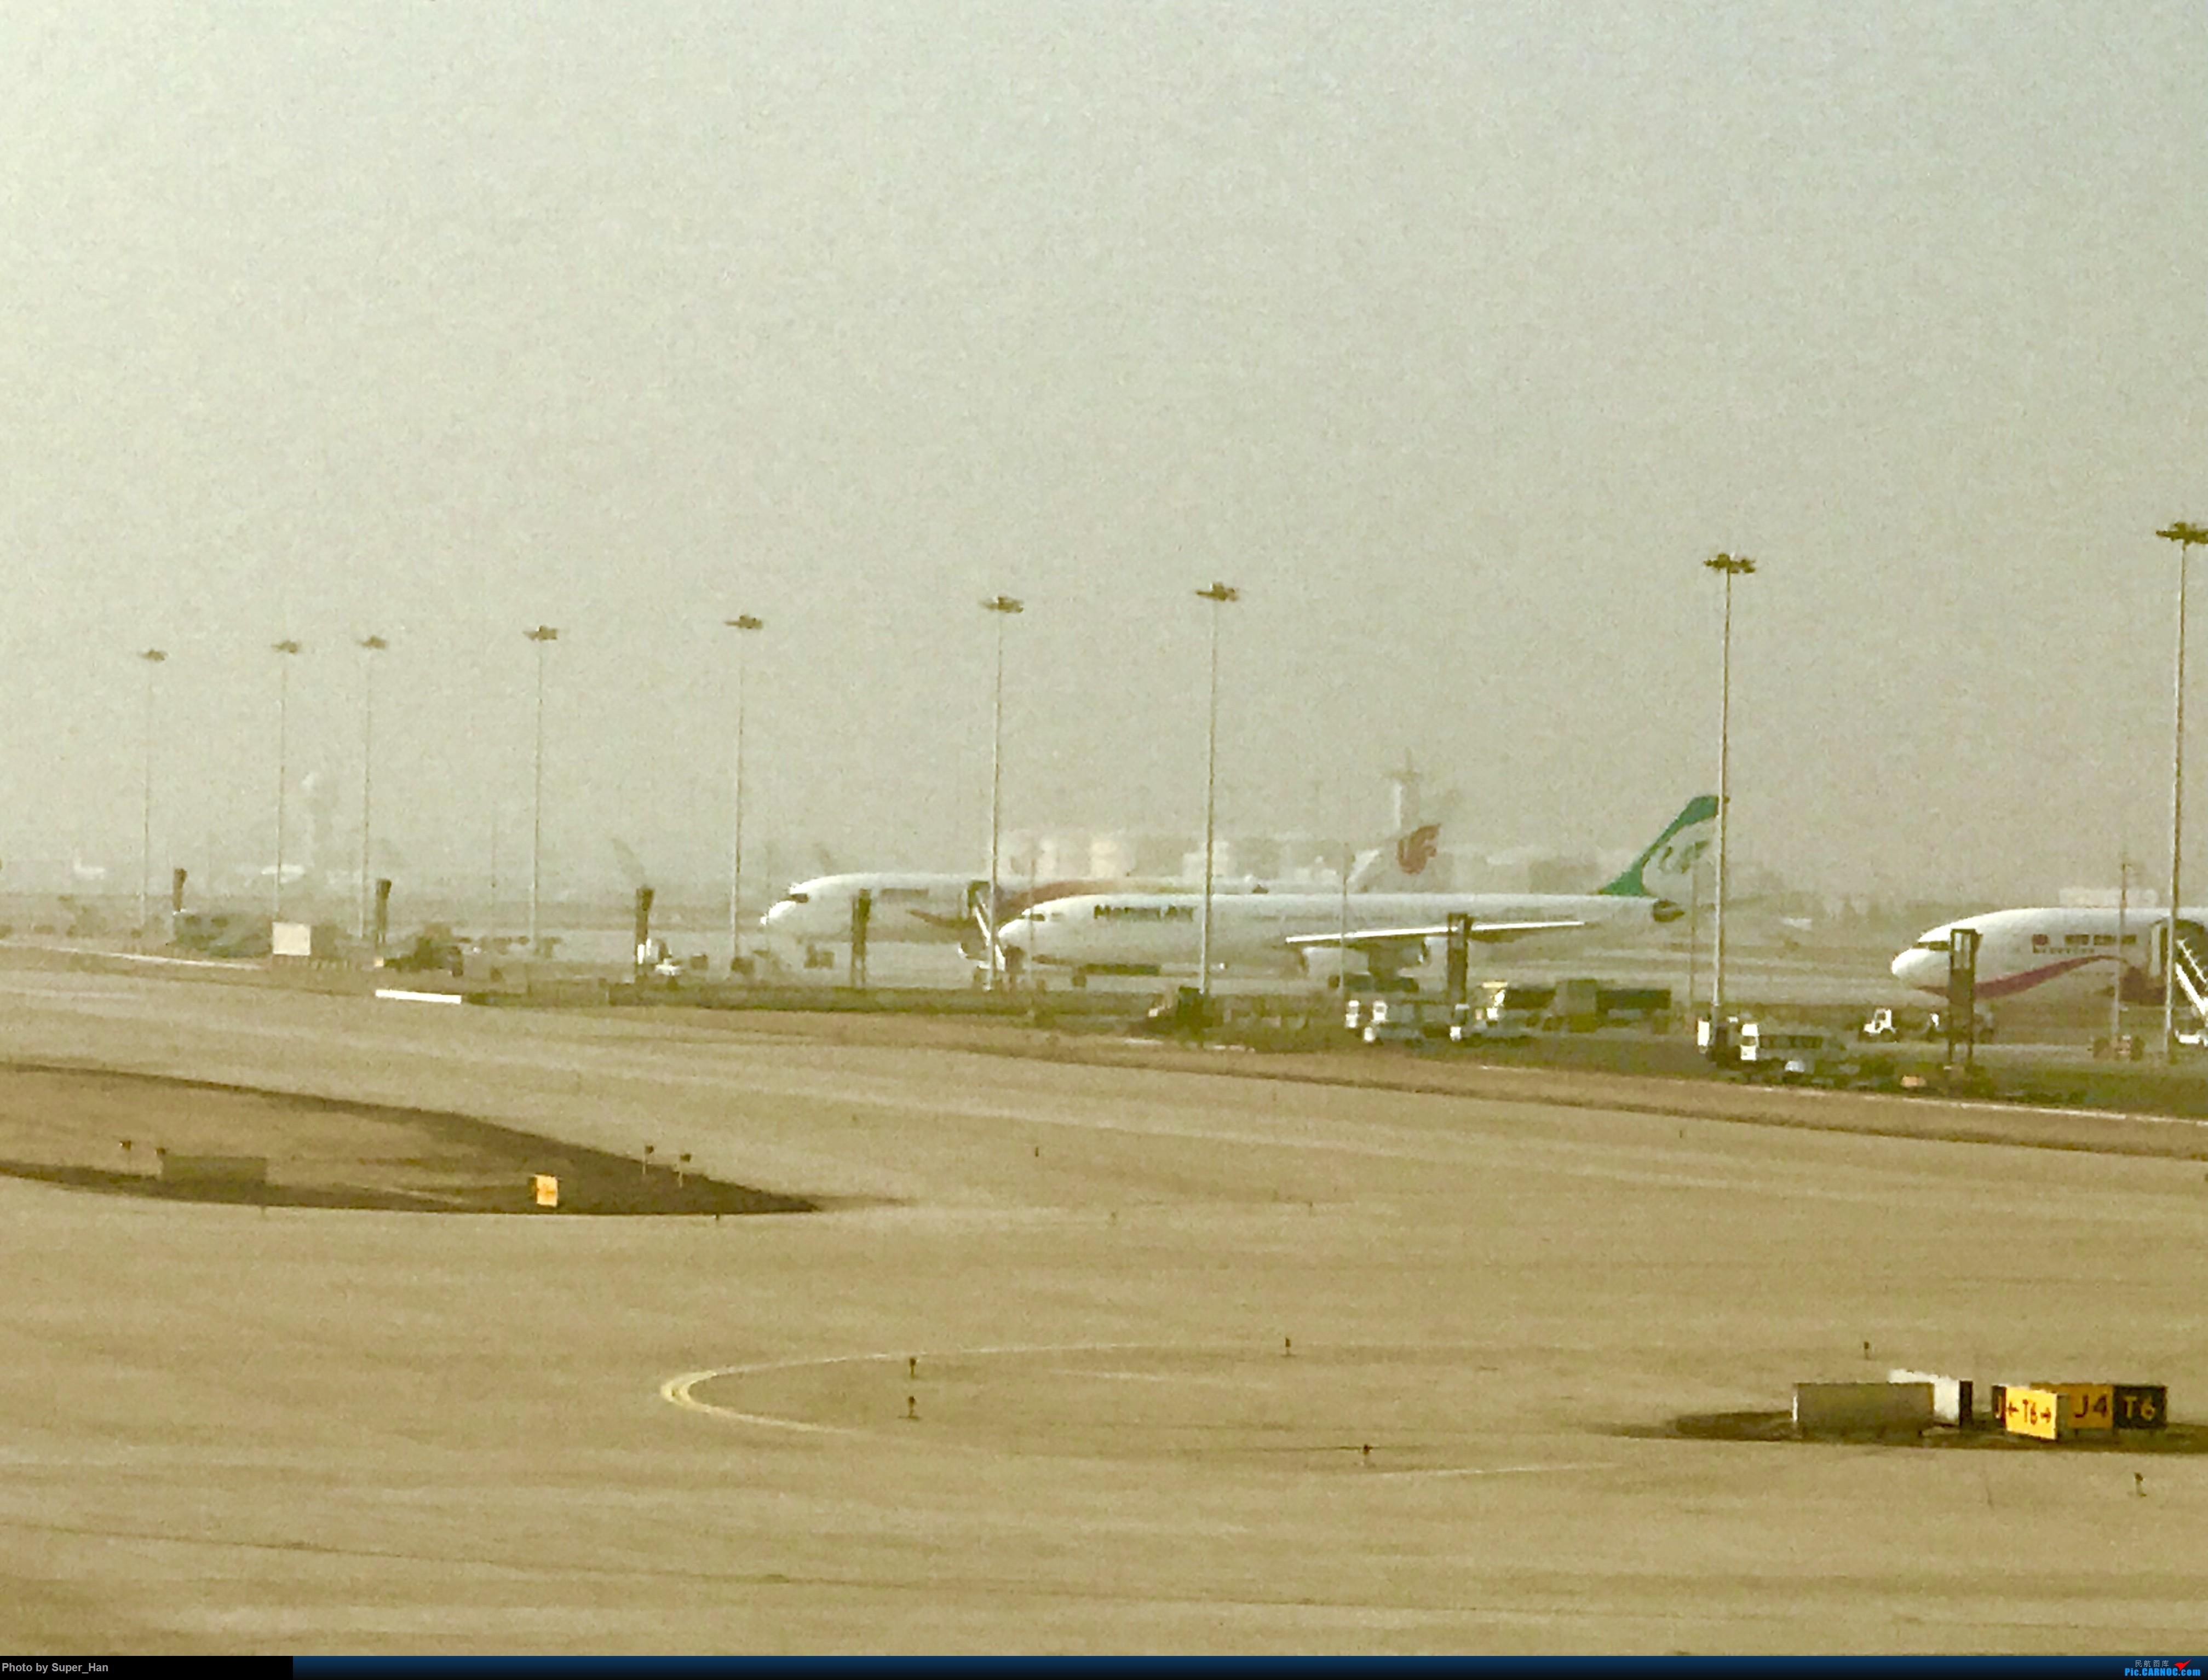 Re:[原创]2019虹桥出发飞北京第一拍 AIRBUS A340-313X EP-MMD 中国北京首都国际机场